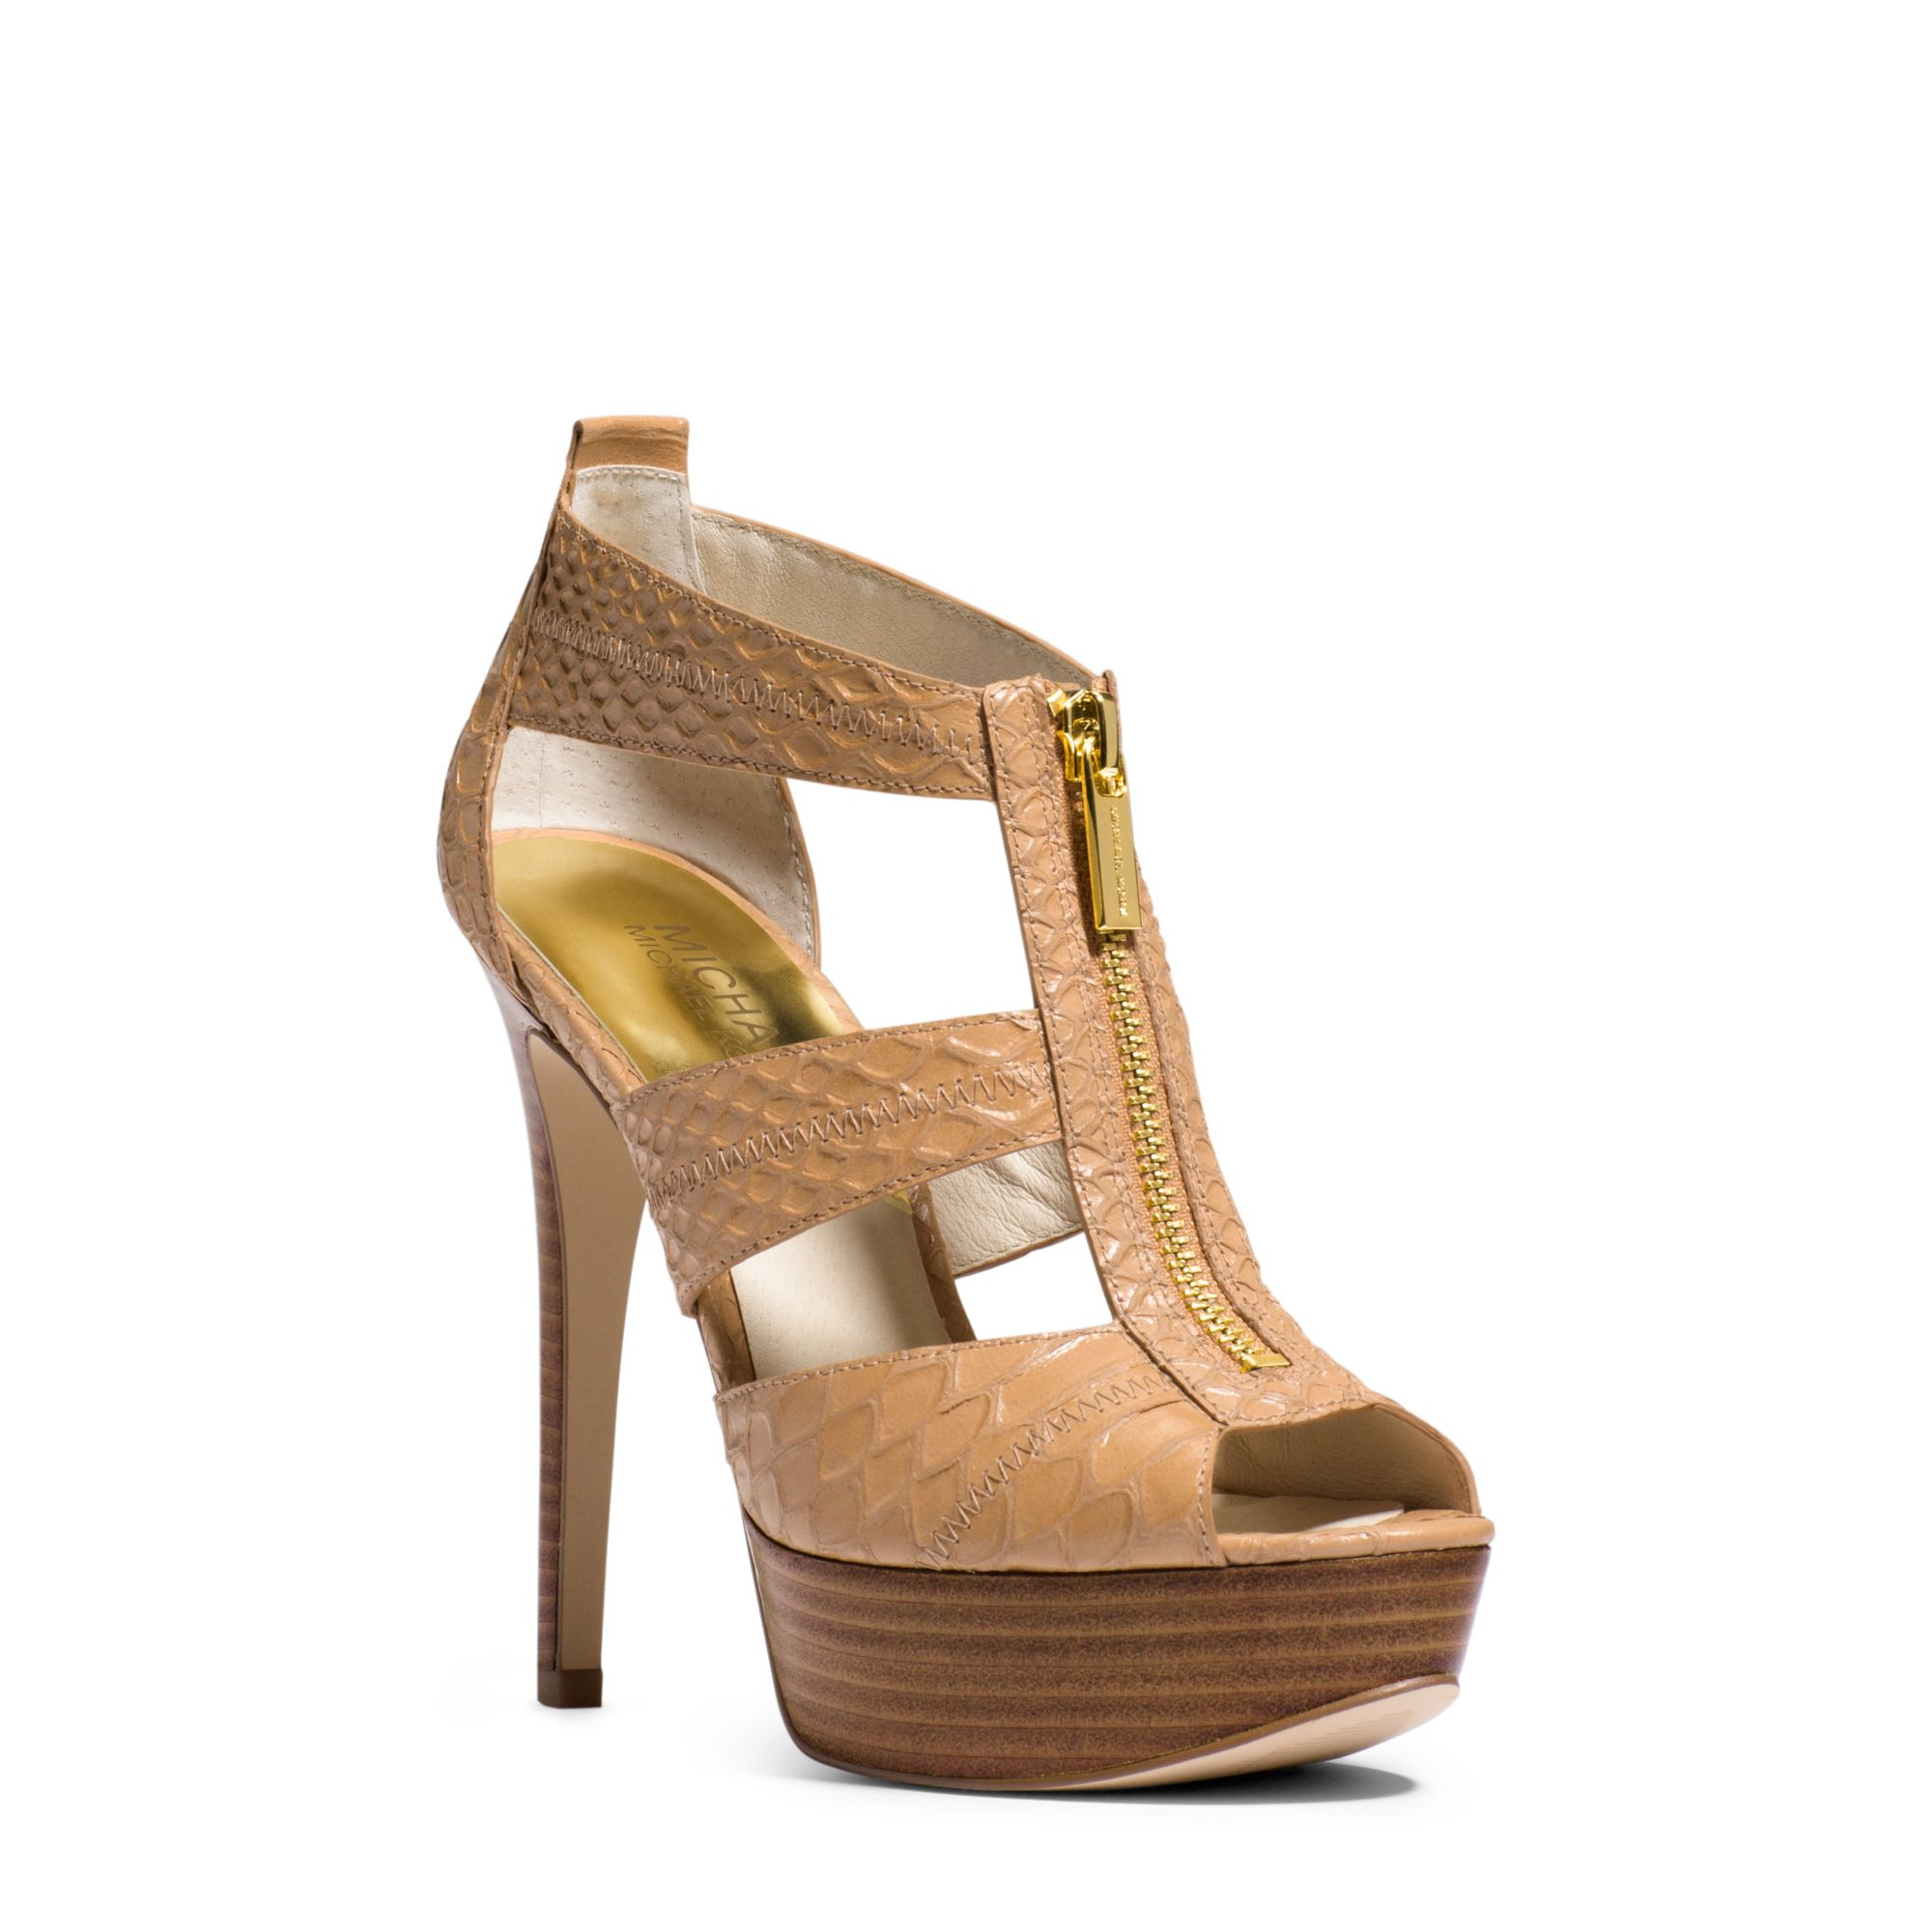 121b27146a83 Lyst - Michael Kors Berkley Embossed-leather Platform Sandal